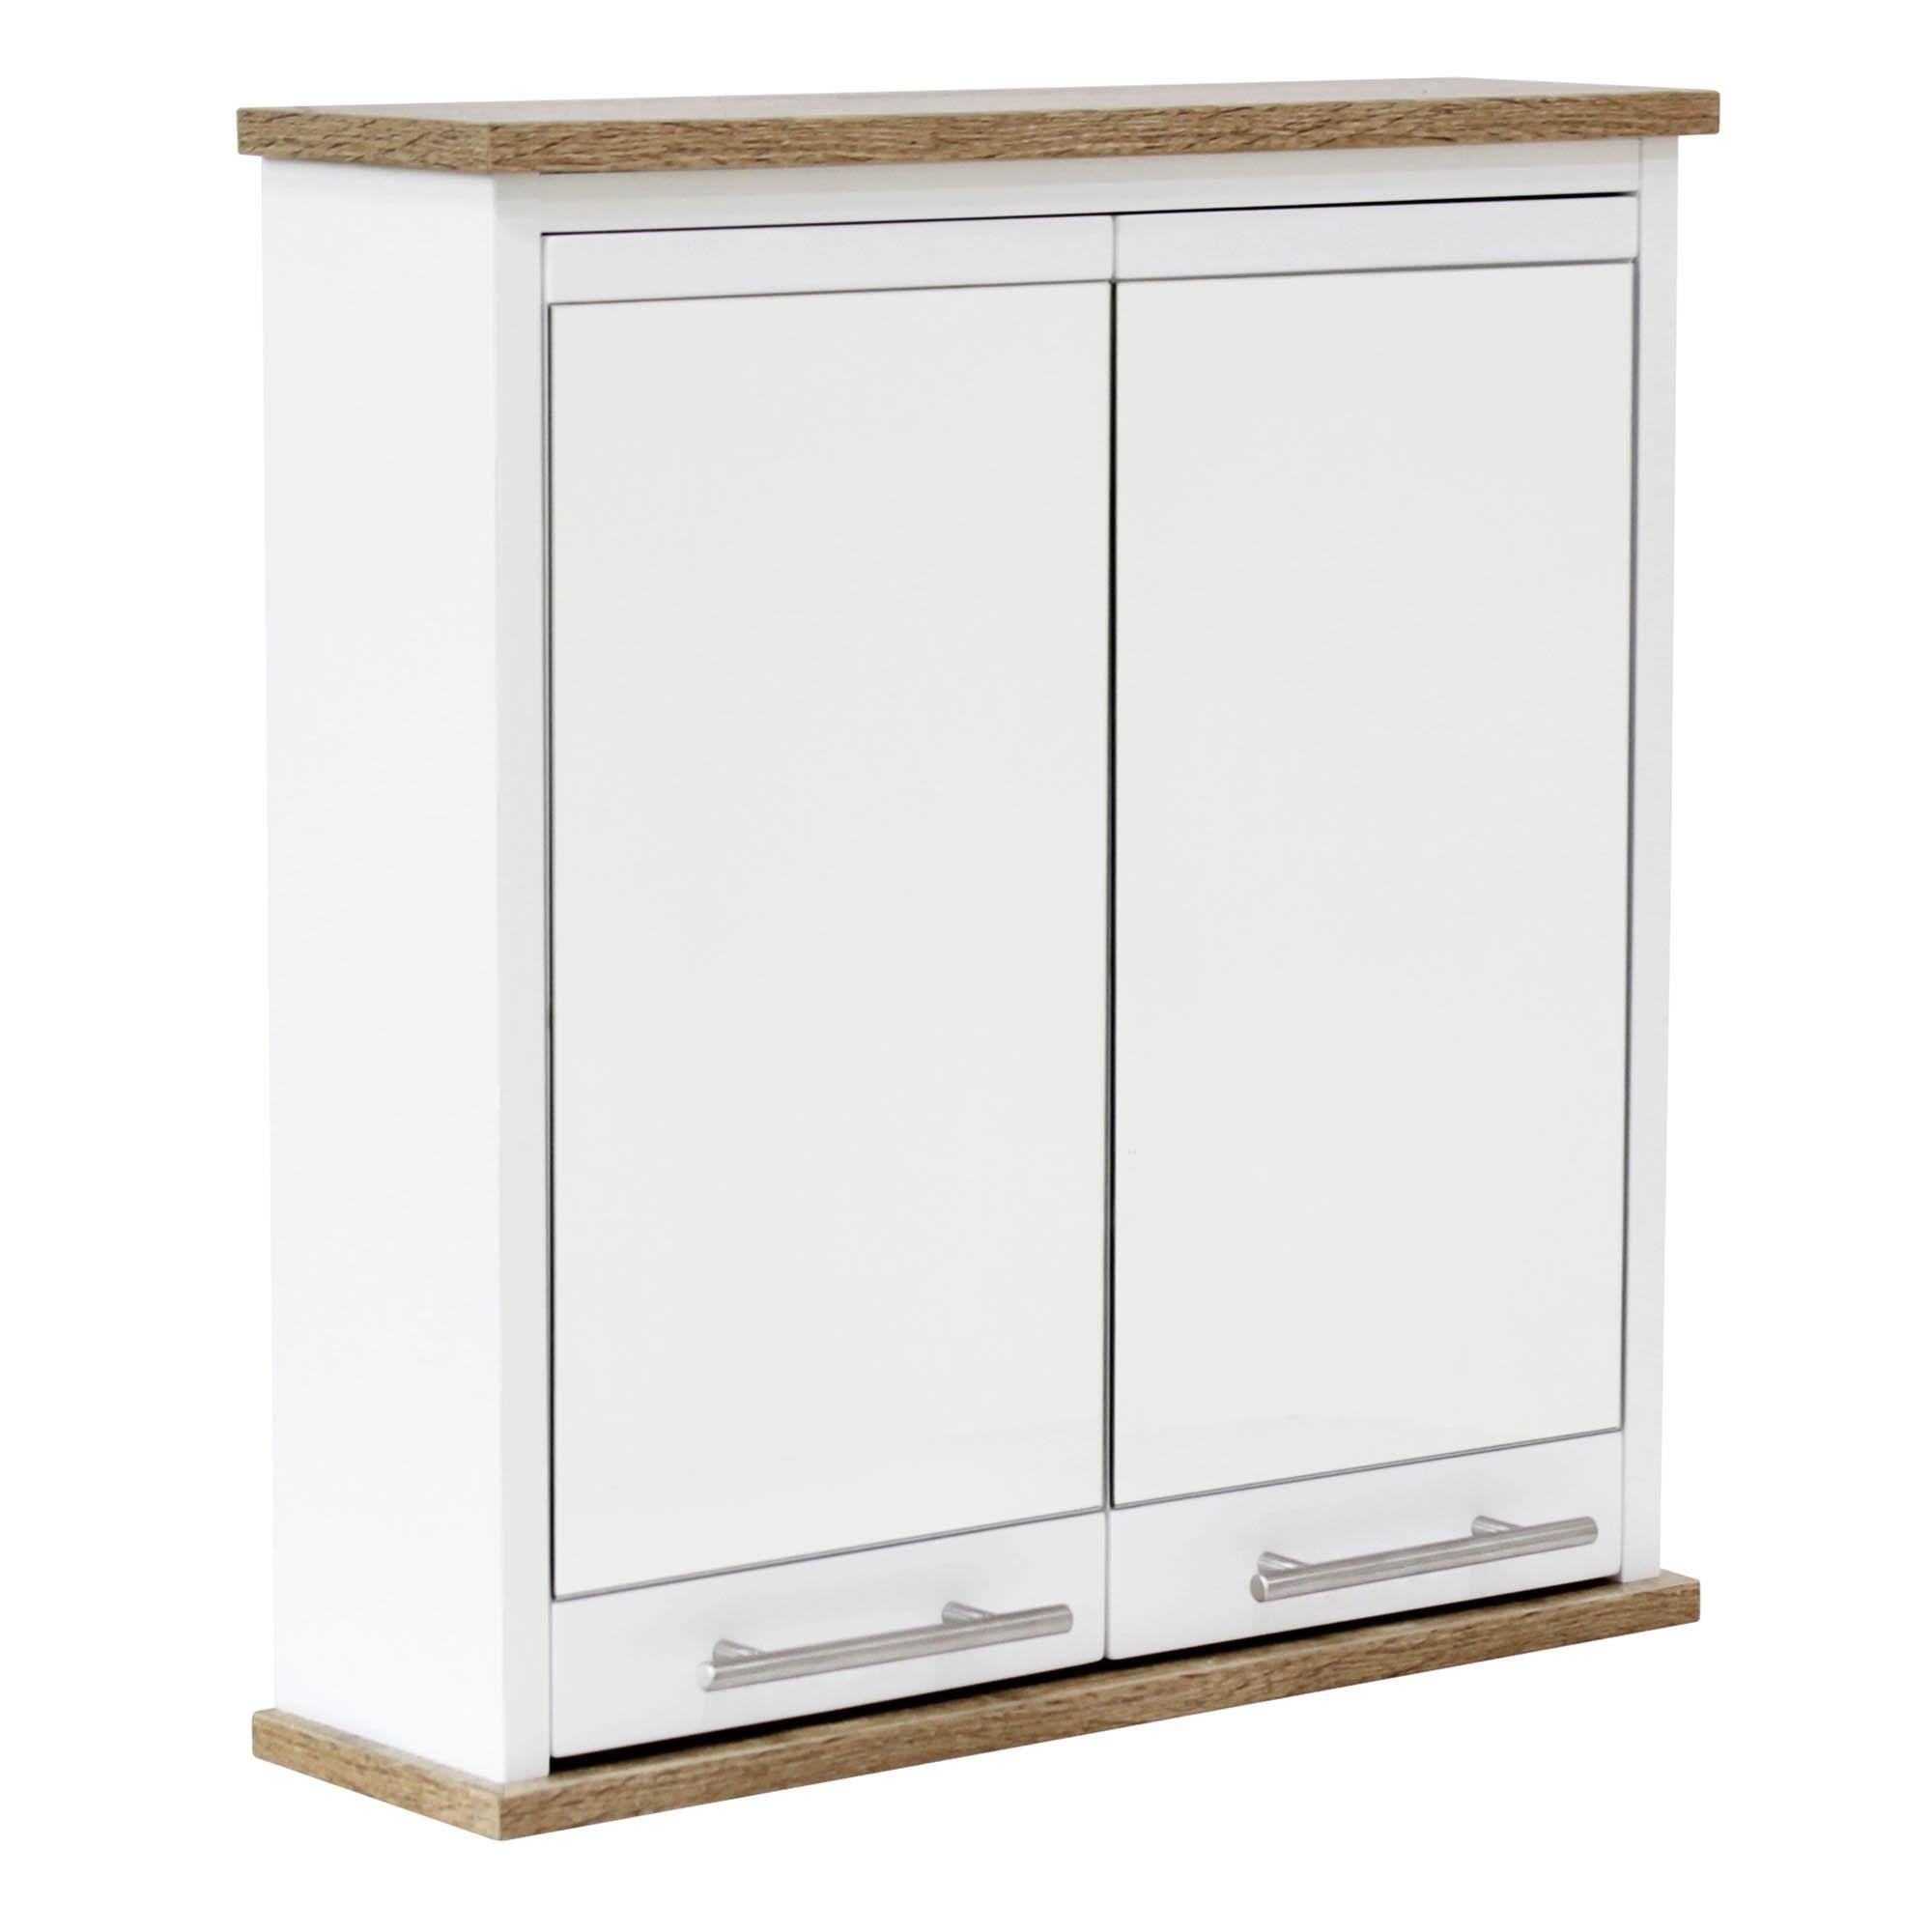 37+ Bathroom cabinets with mirror dunelm inspiration